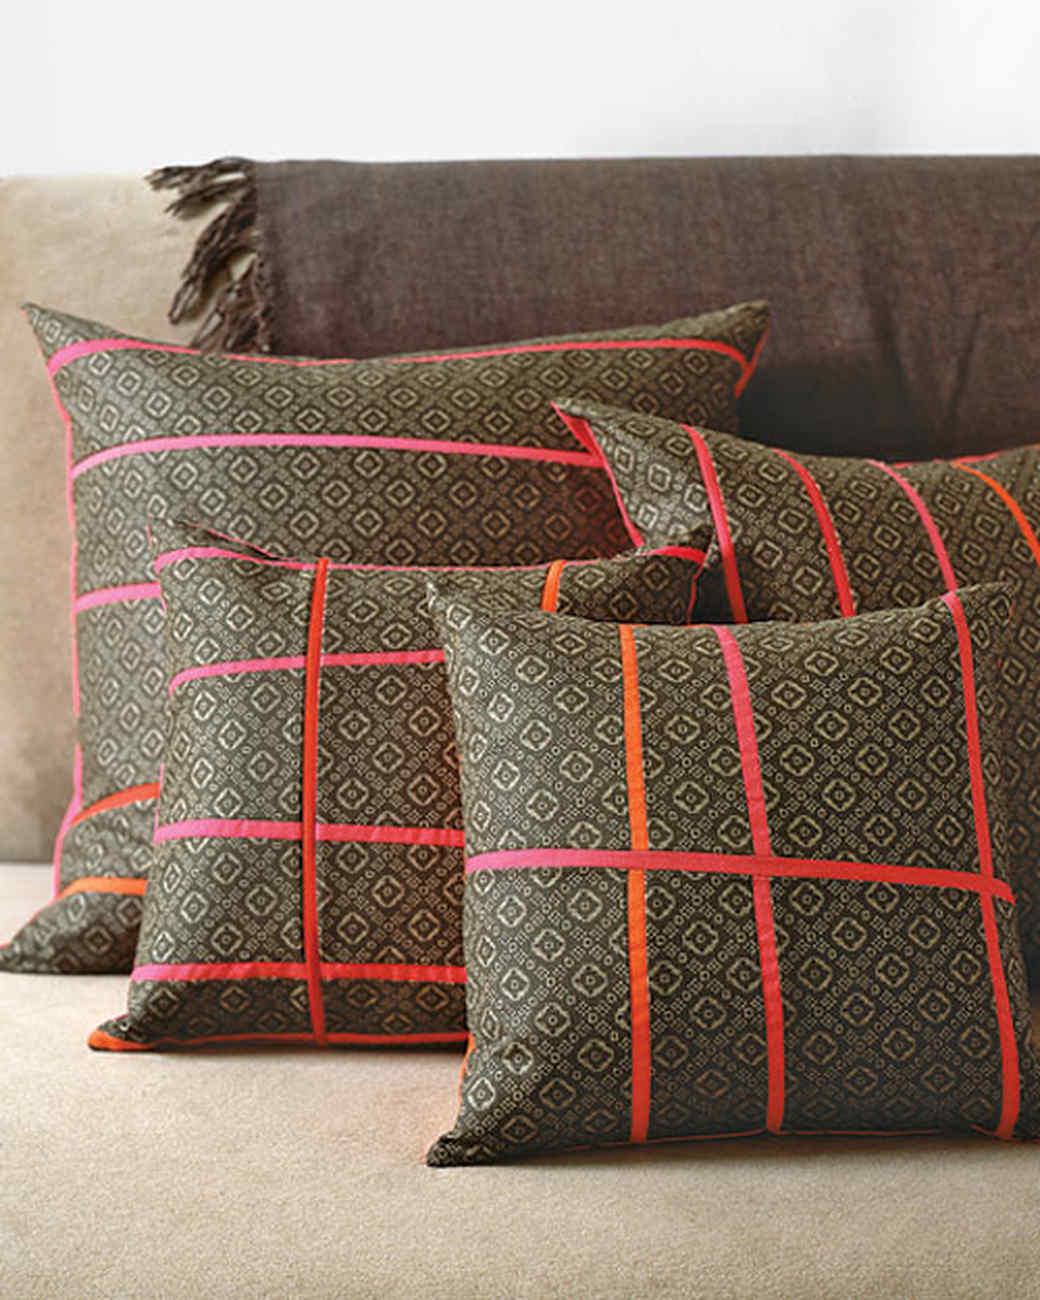 la1458_1007_pillow.jpg